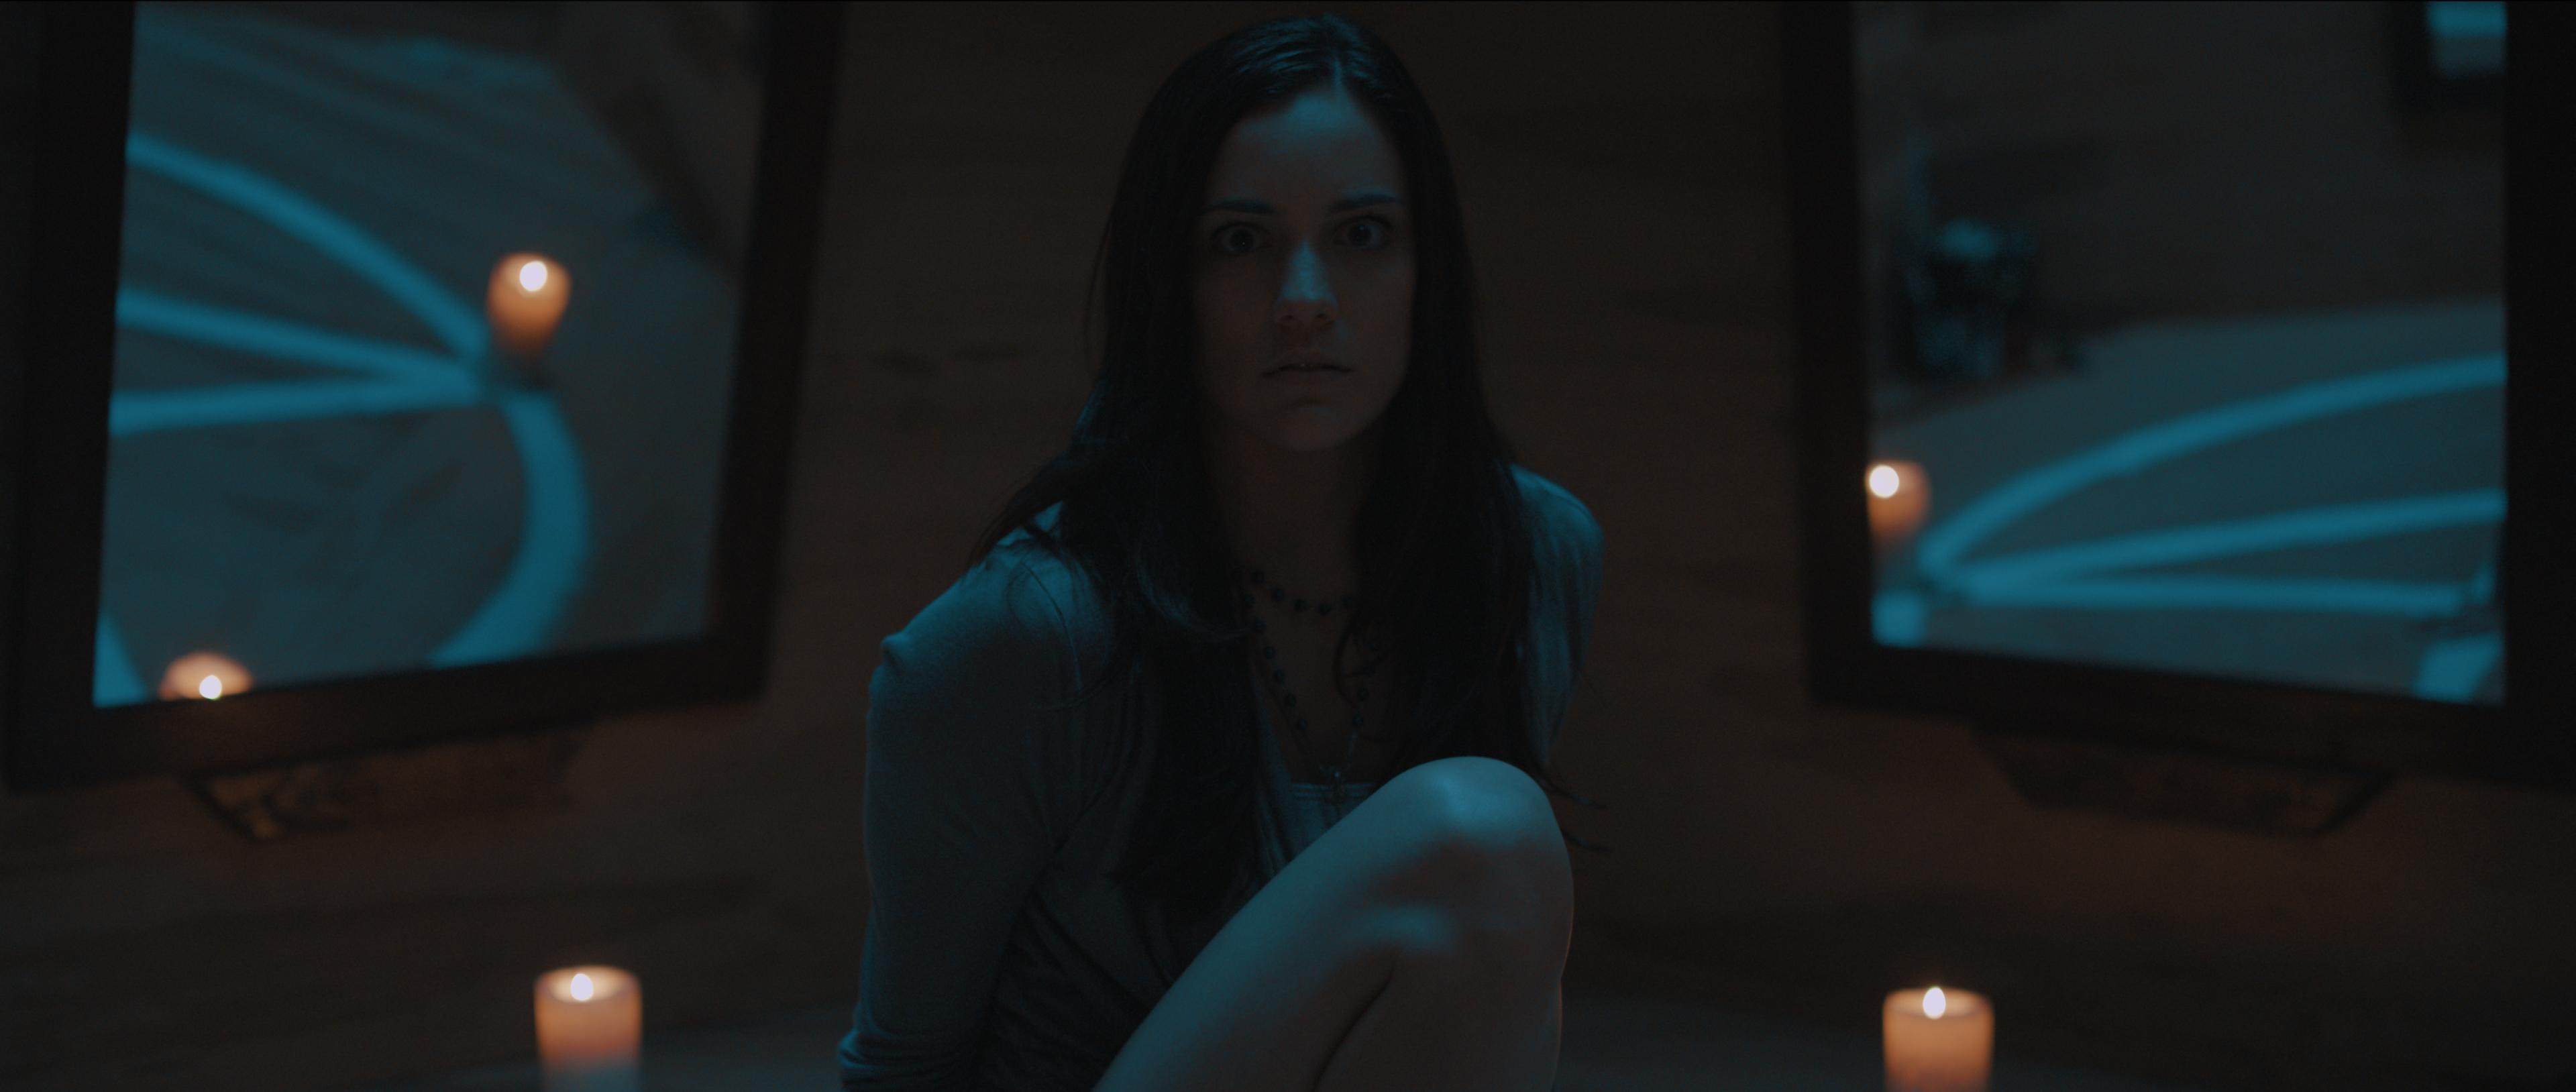 Erin Marie Hogan in Dwelling (2016)